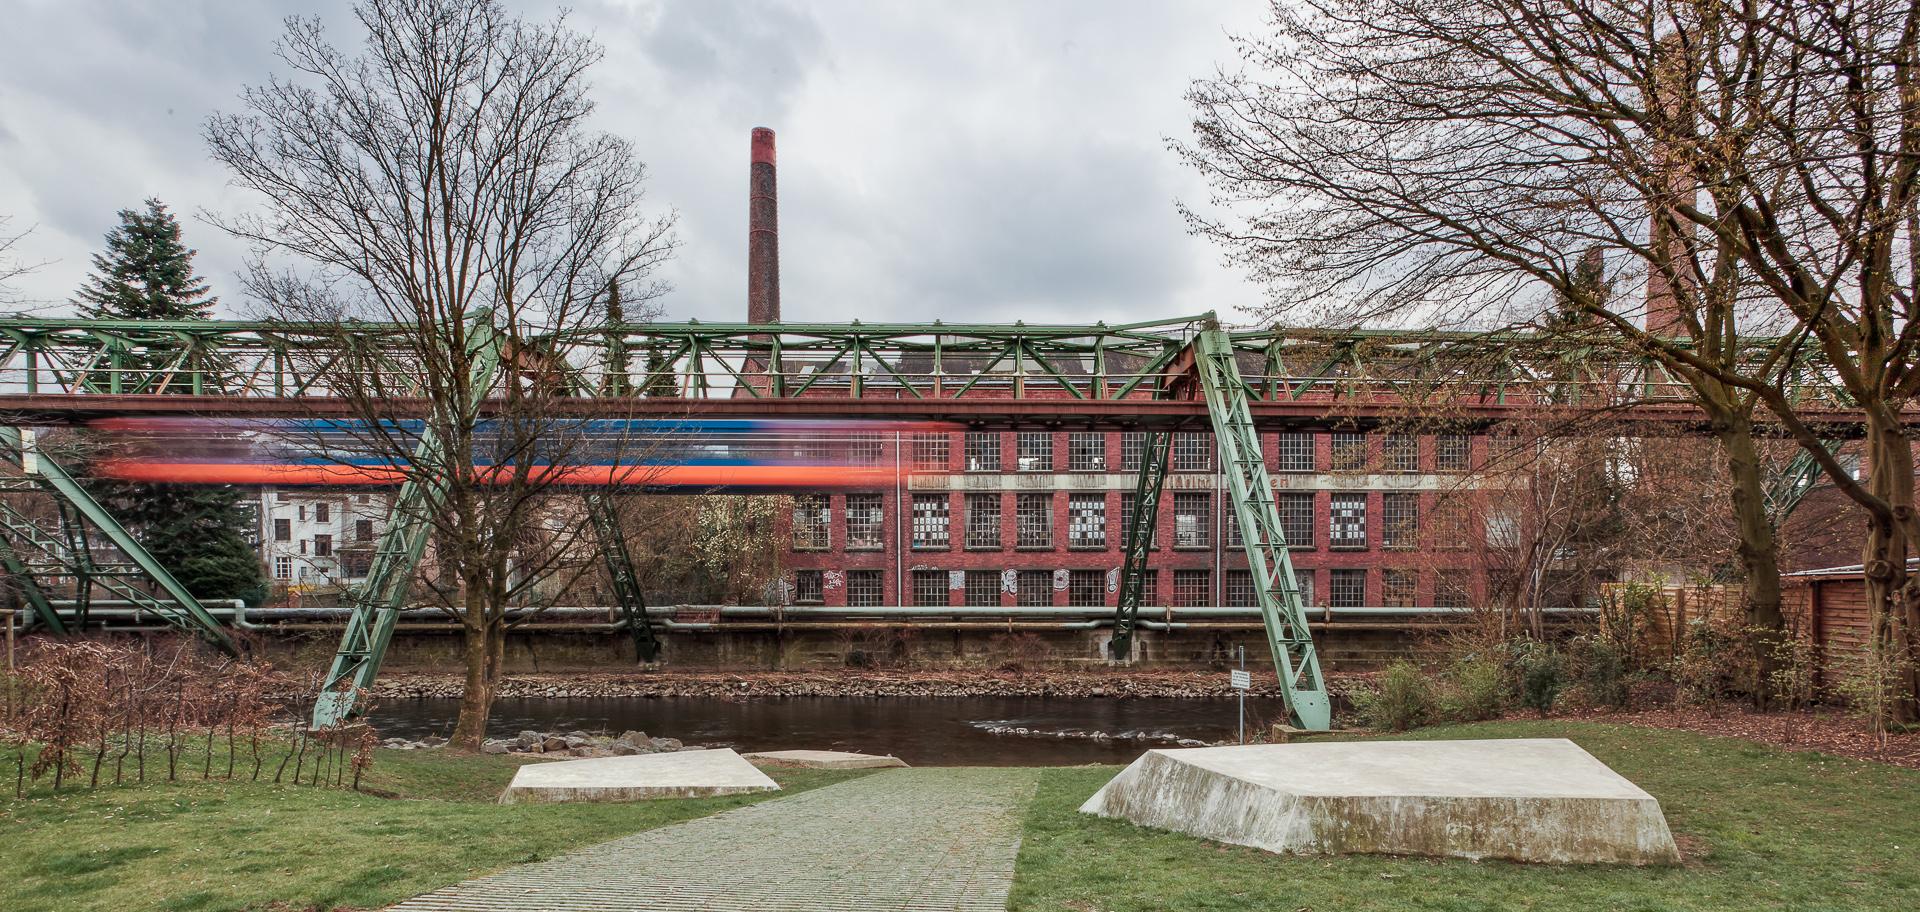 August Schwebebahn Wuppertal